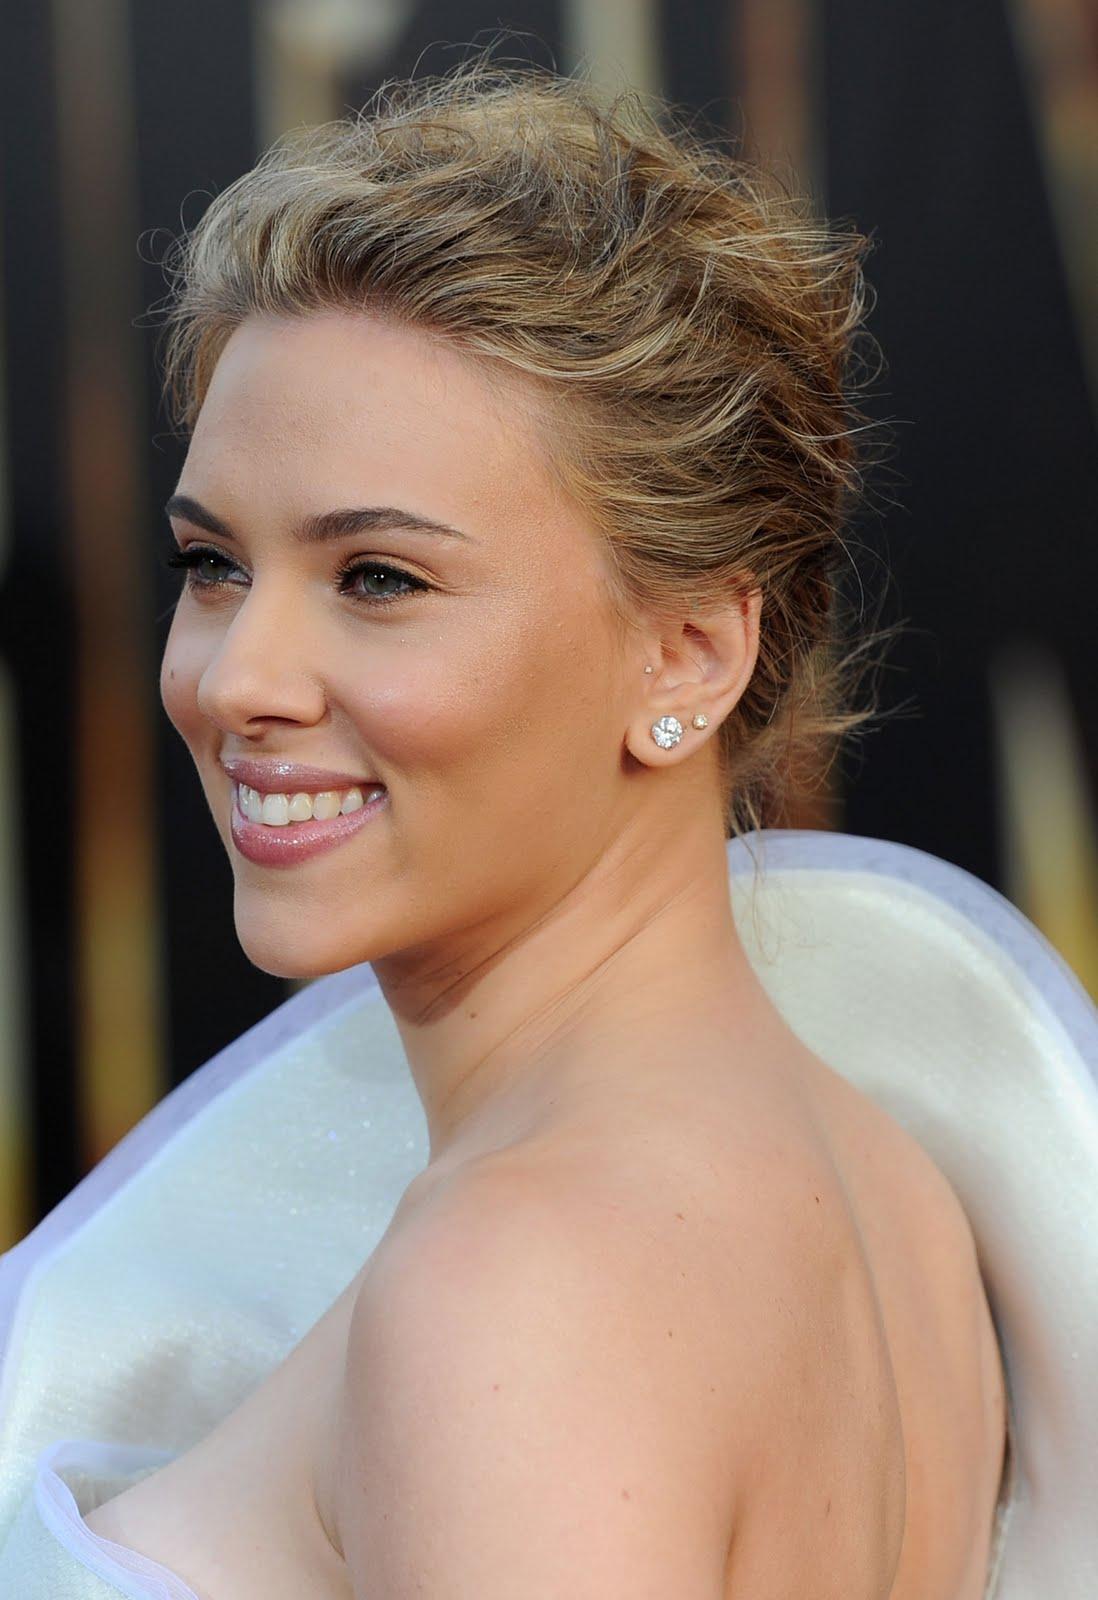 http://2.bp.blogspot.com/-Bbs2M_zFZIk/TgRm2THrjnI/AAAAAAAAFD0/SHI8Irtvp_U/s1600/Scarlett-Johansson-10.jpg